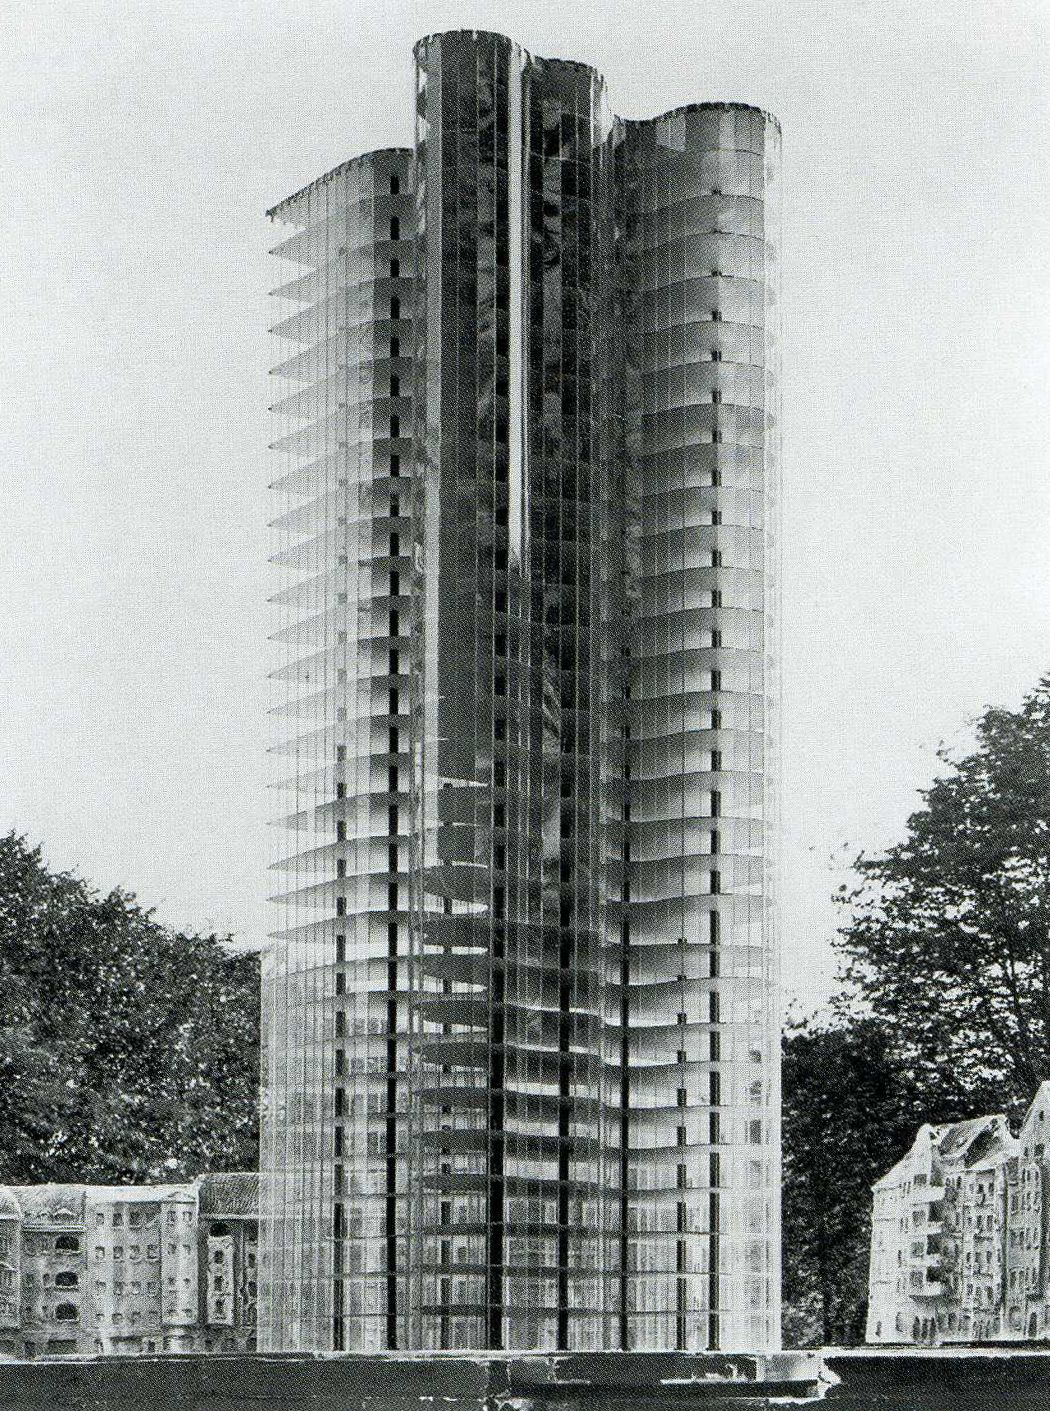 Modell Glashochhaus Mies Van Der Rohe 1922 Novembergruppe